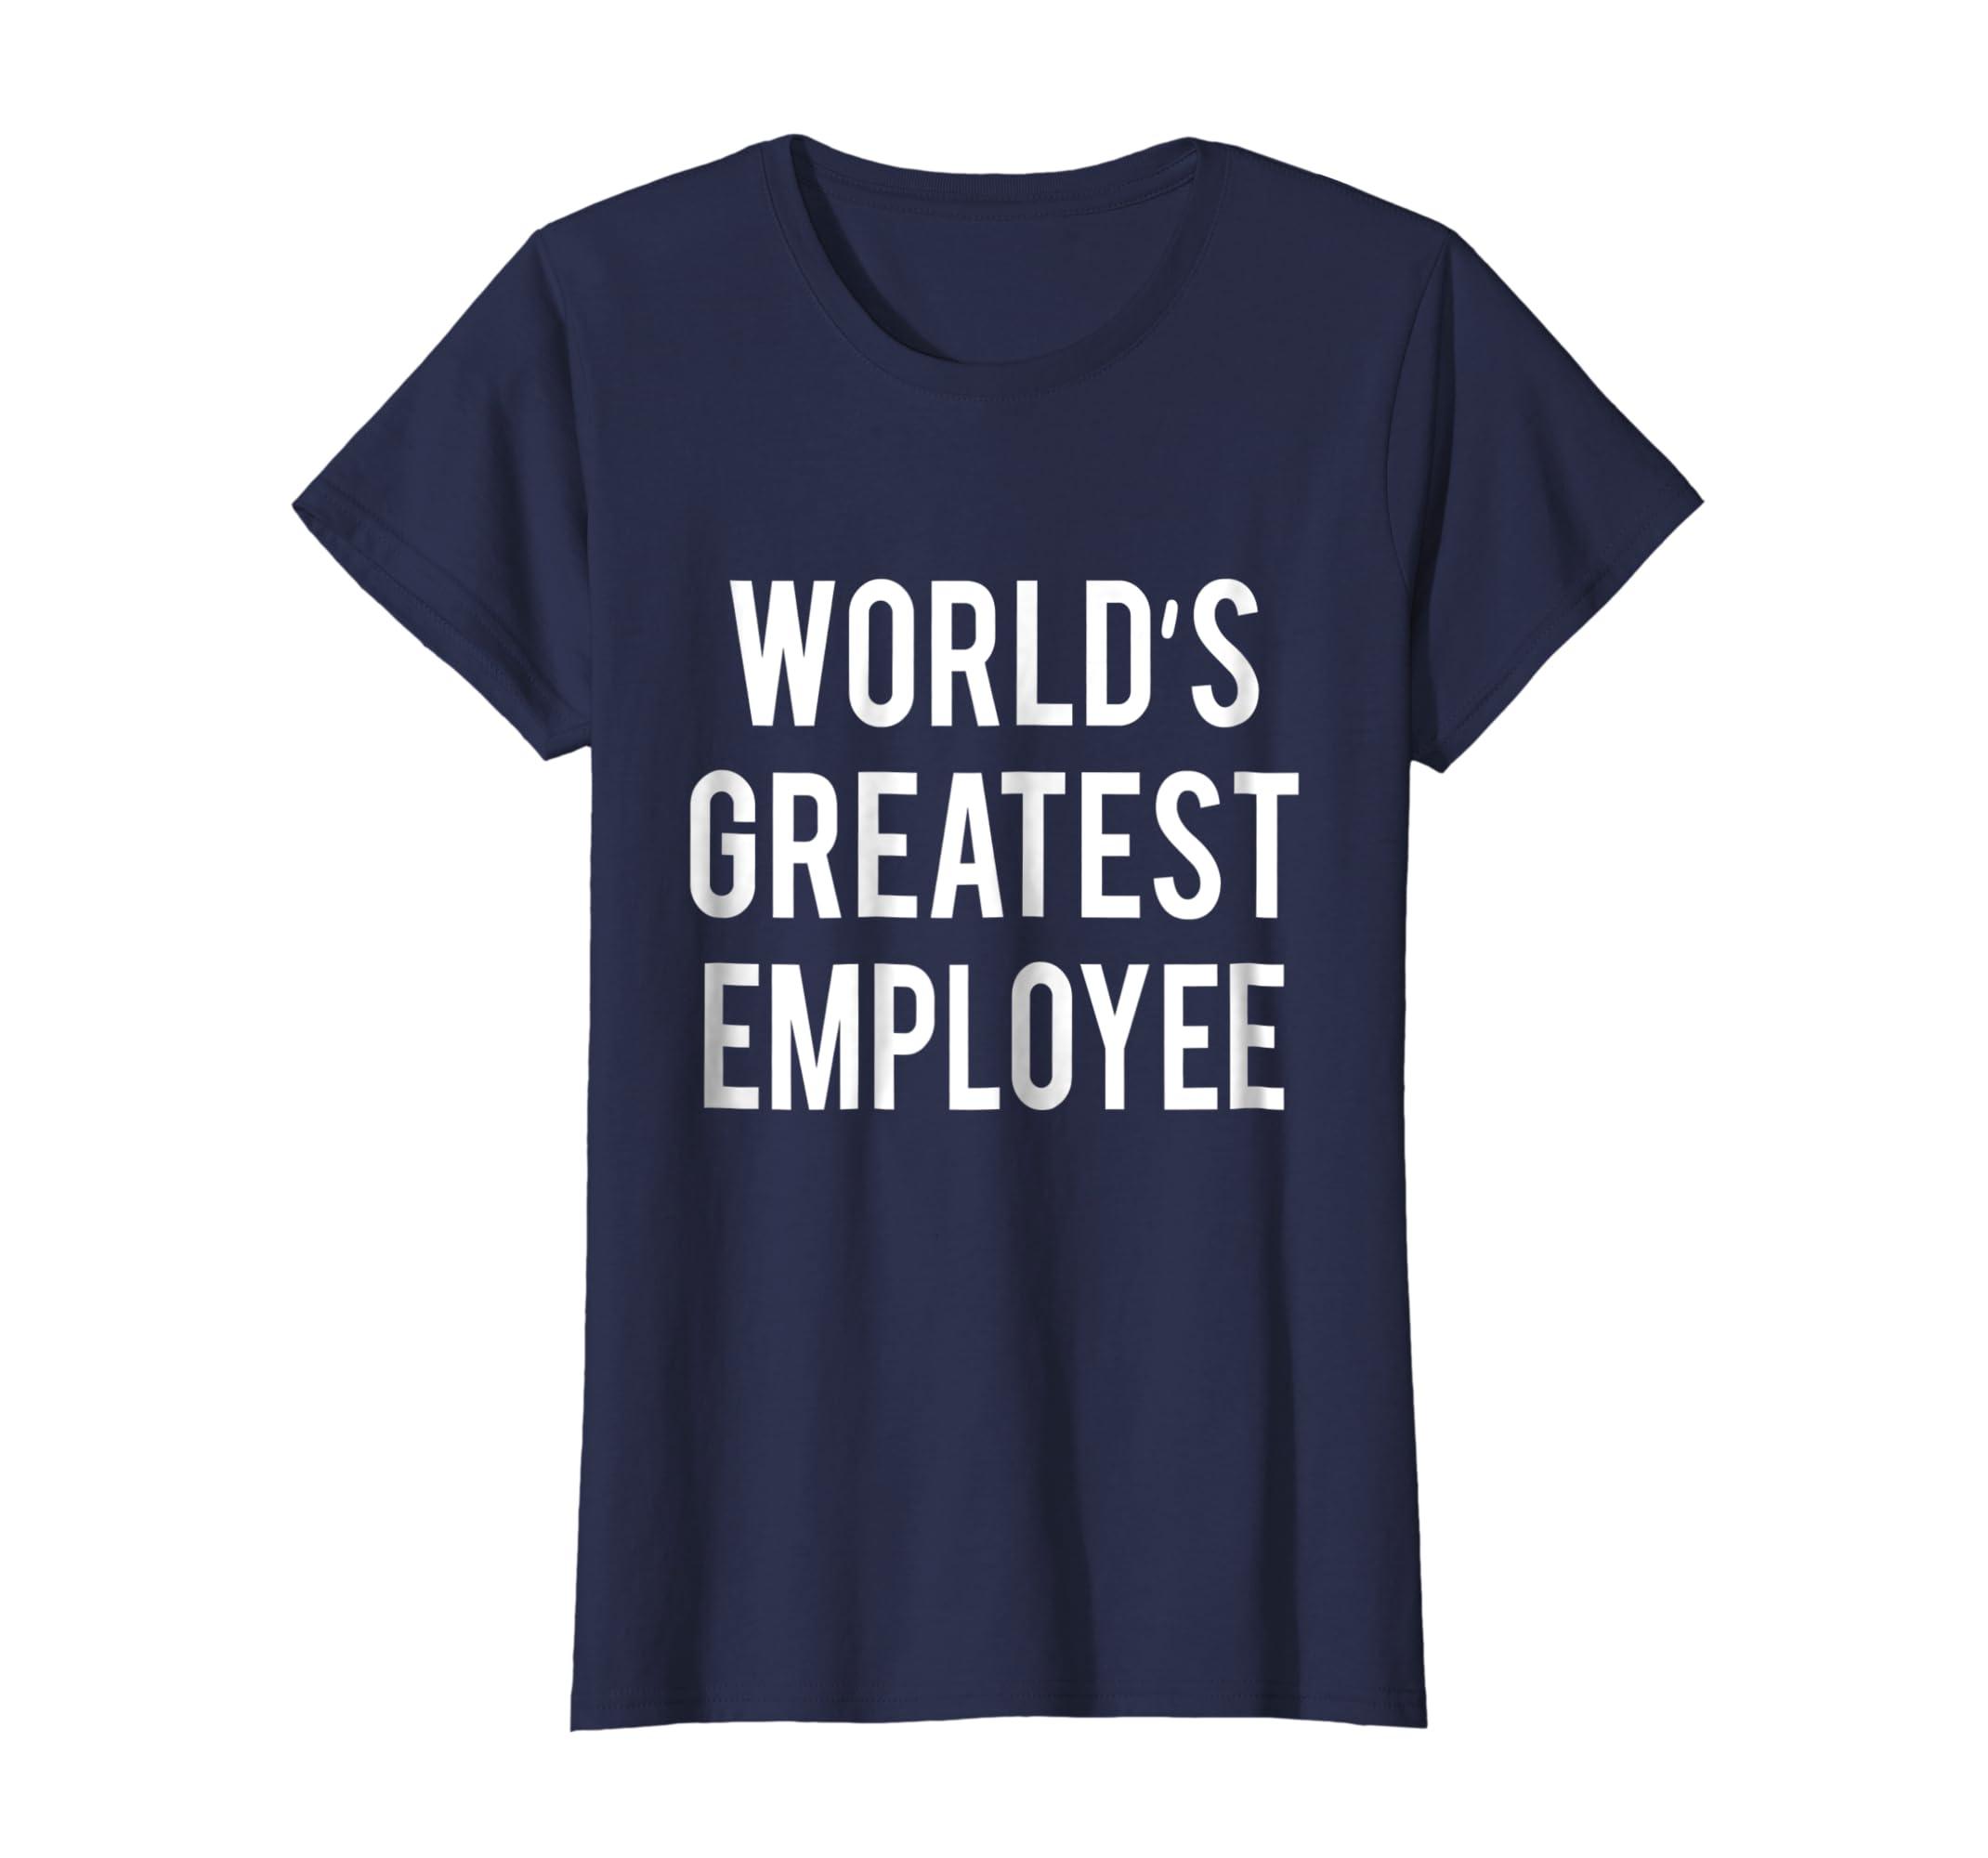 5eeaa14628 Amazon.com: World's Greatest Employee Tee Shirt Best Funny Gift Ideas:  Clothing